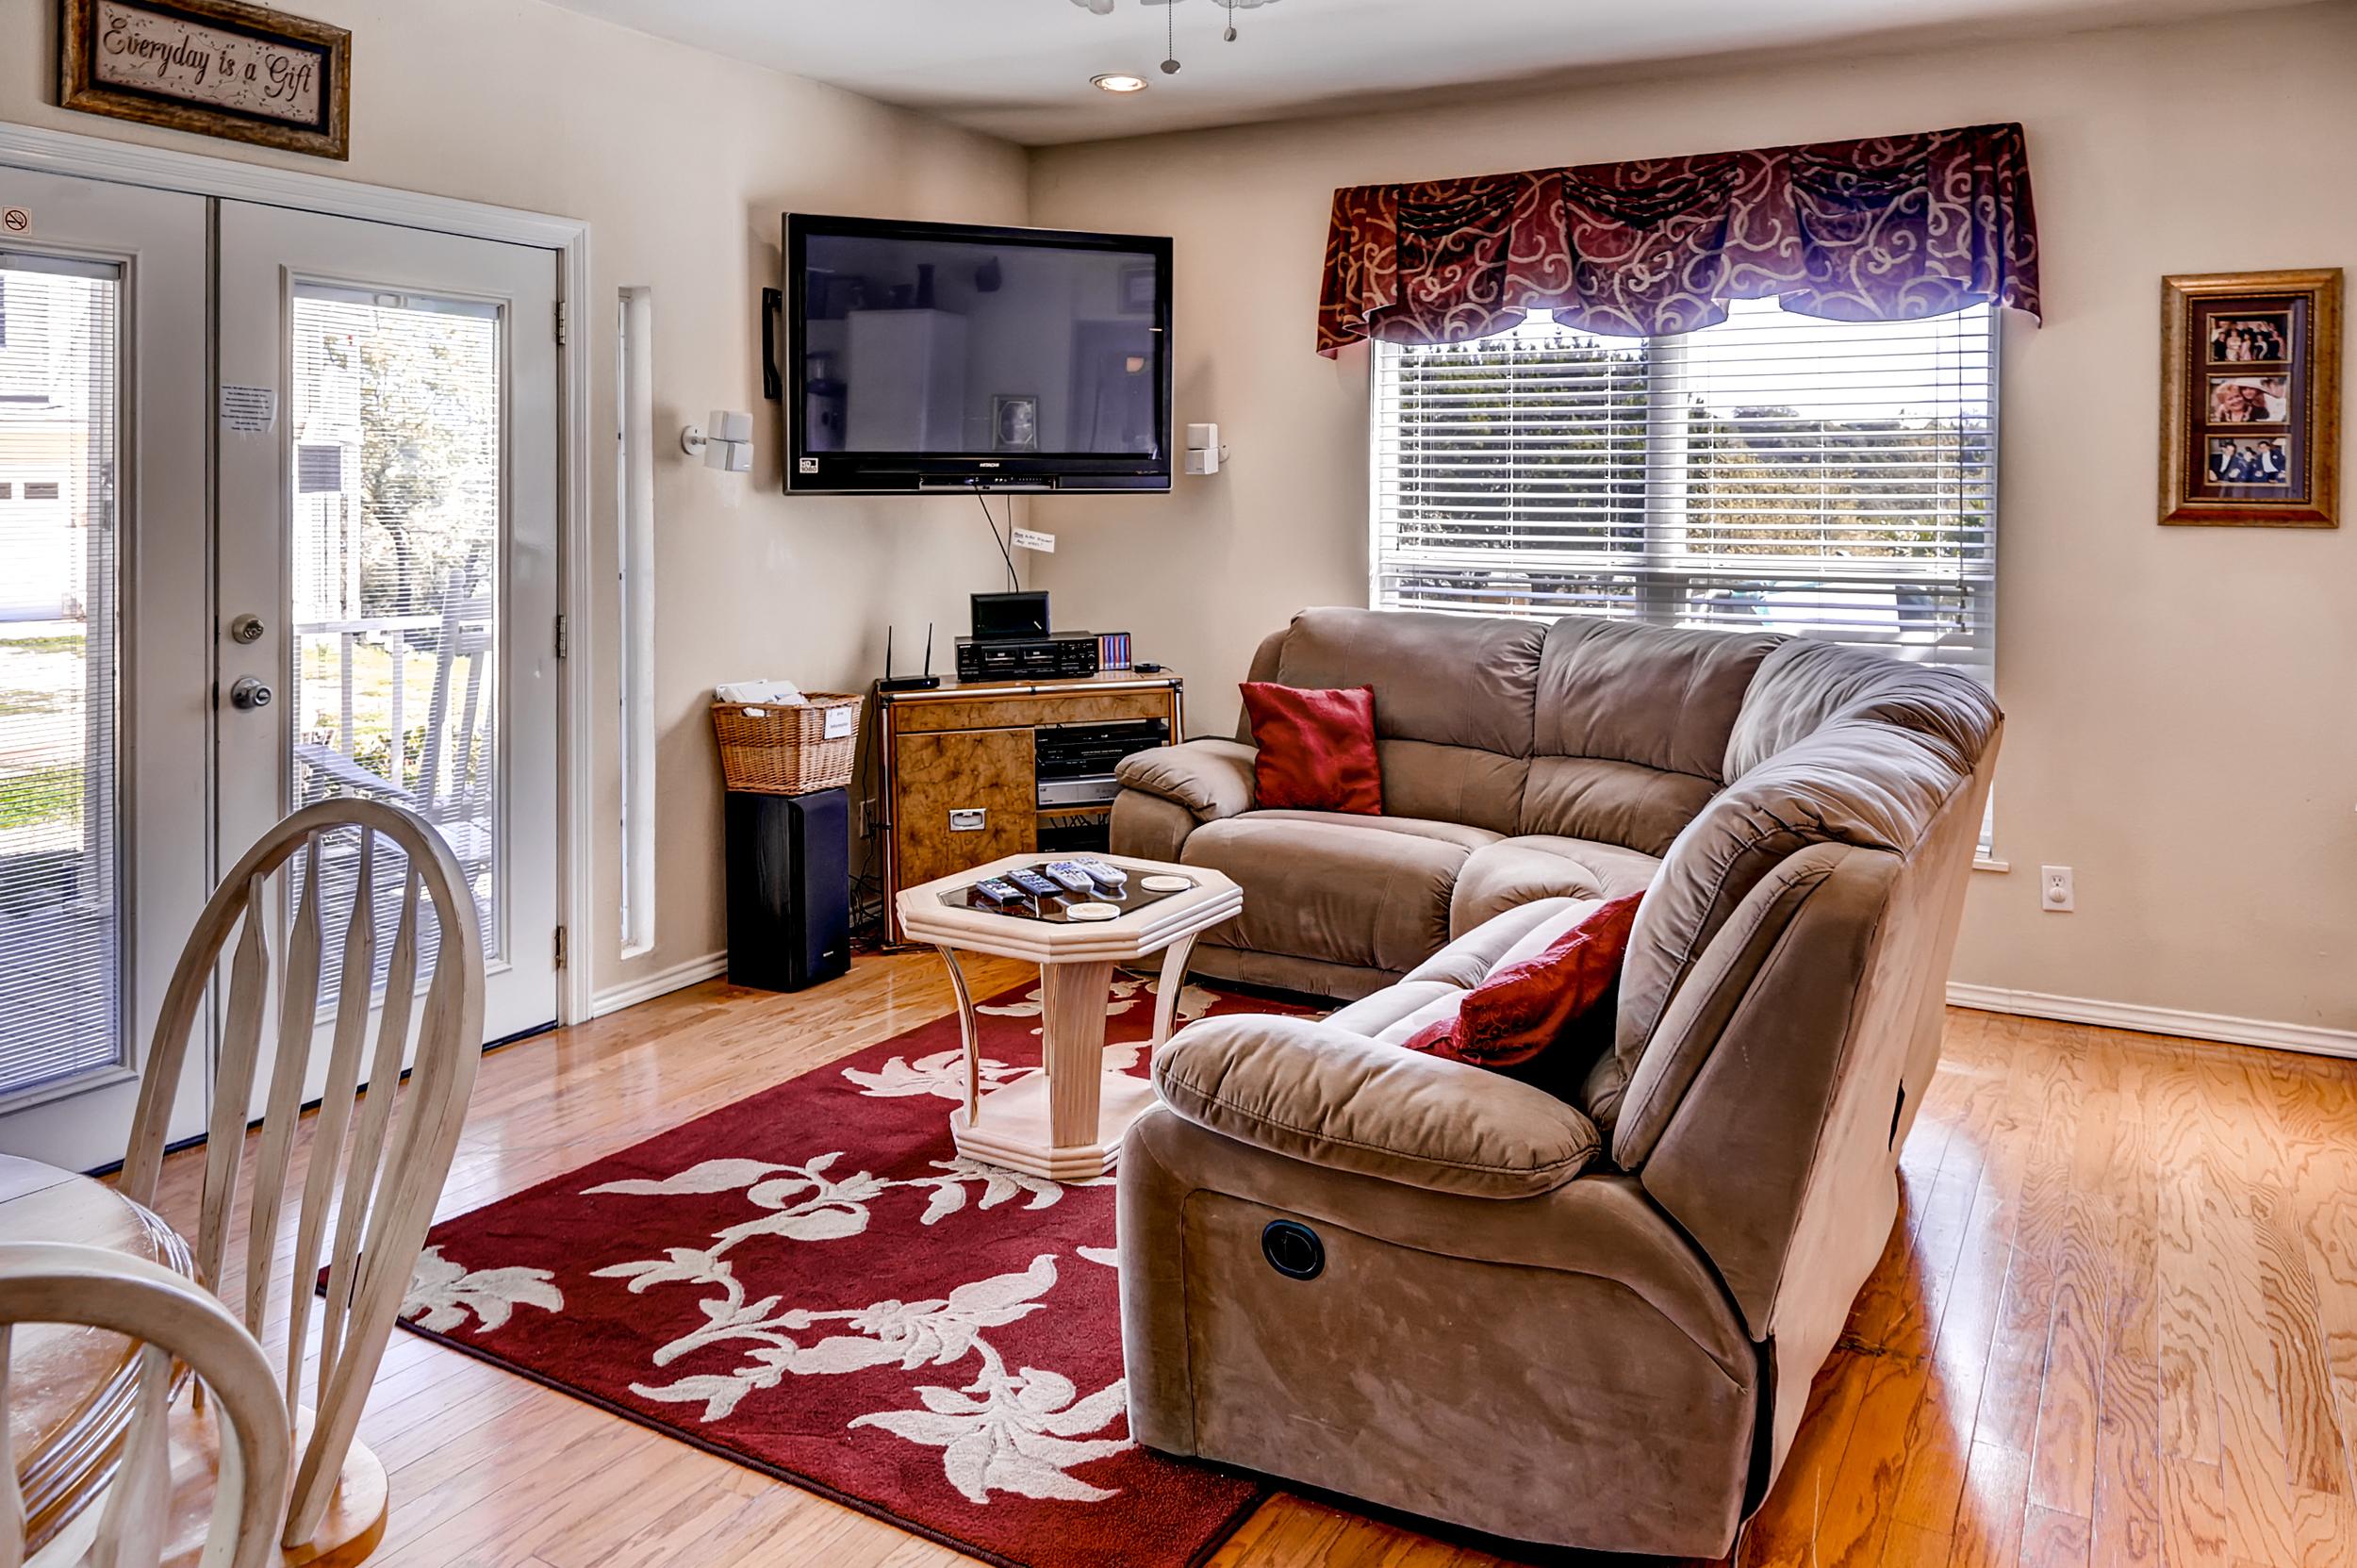 QuintilianiTamra - Living Room (house 2) 2.jpg